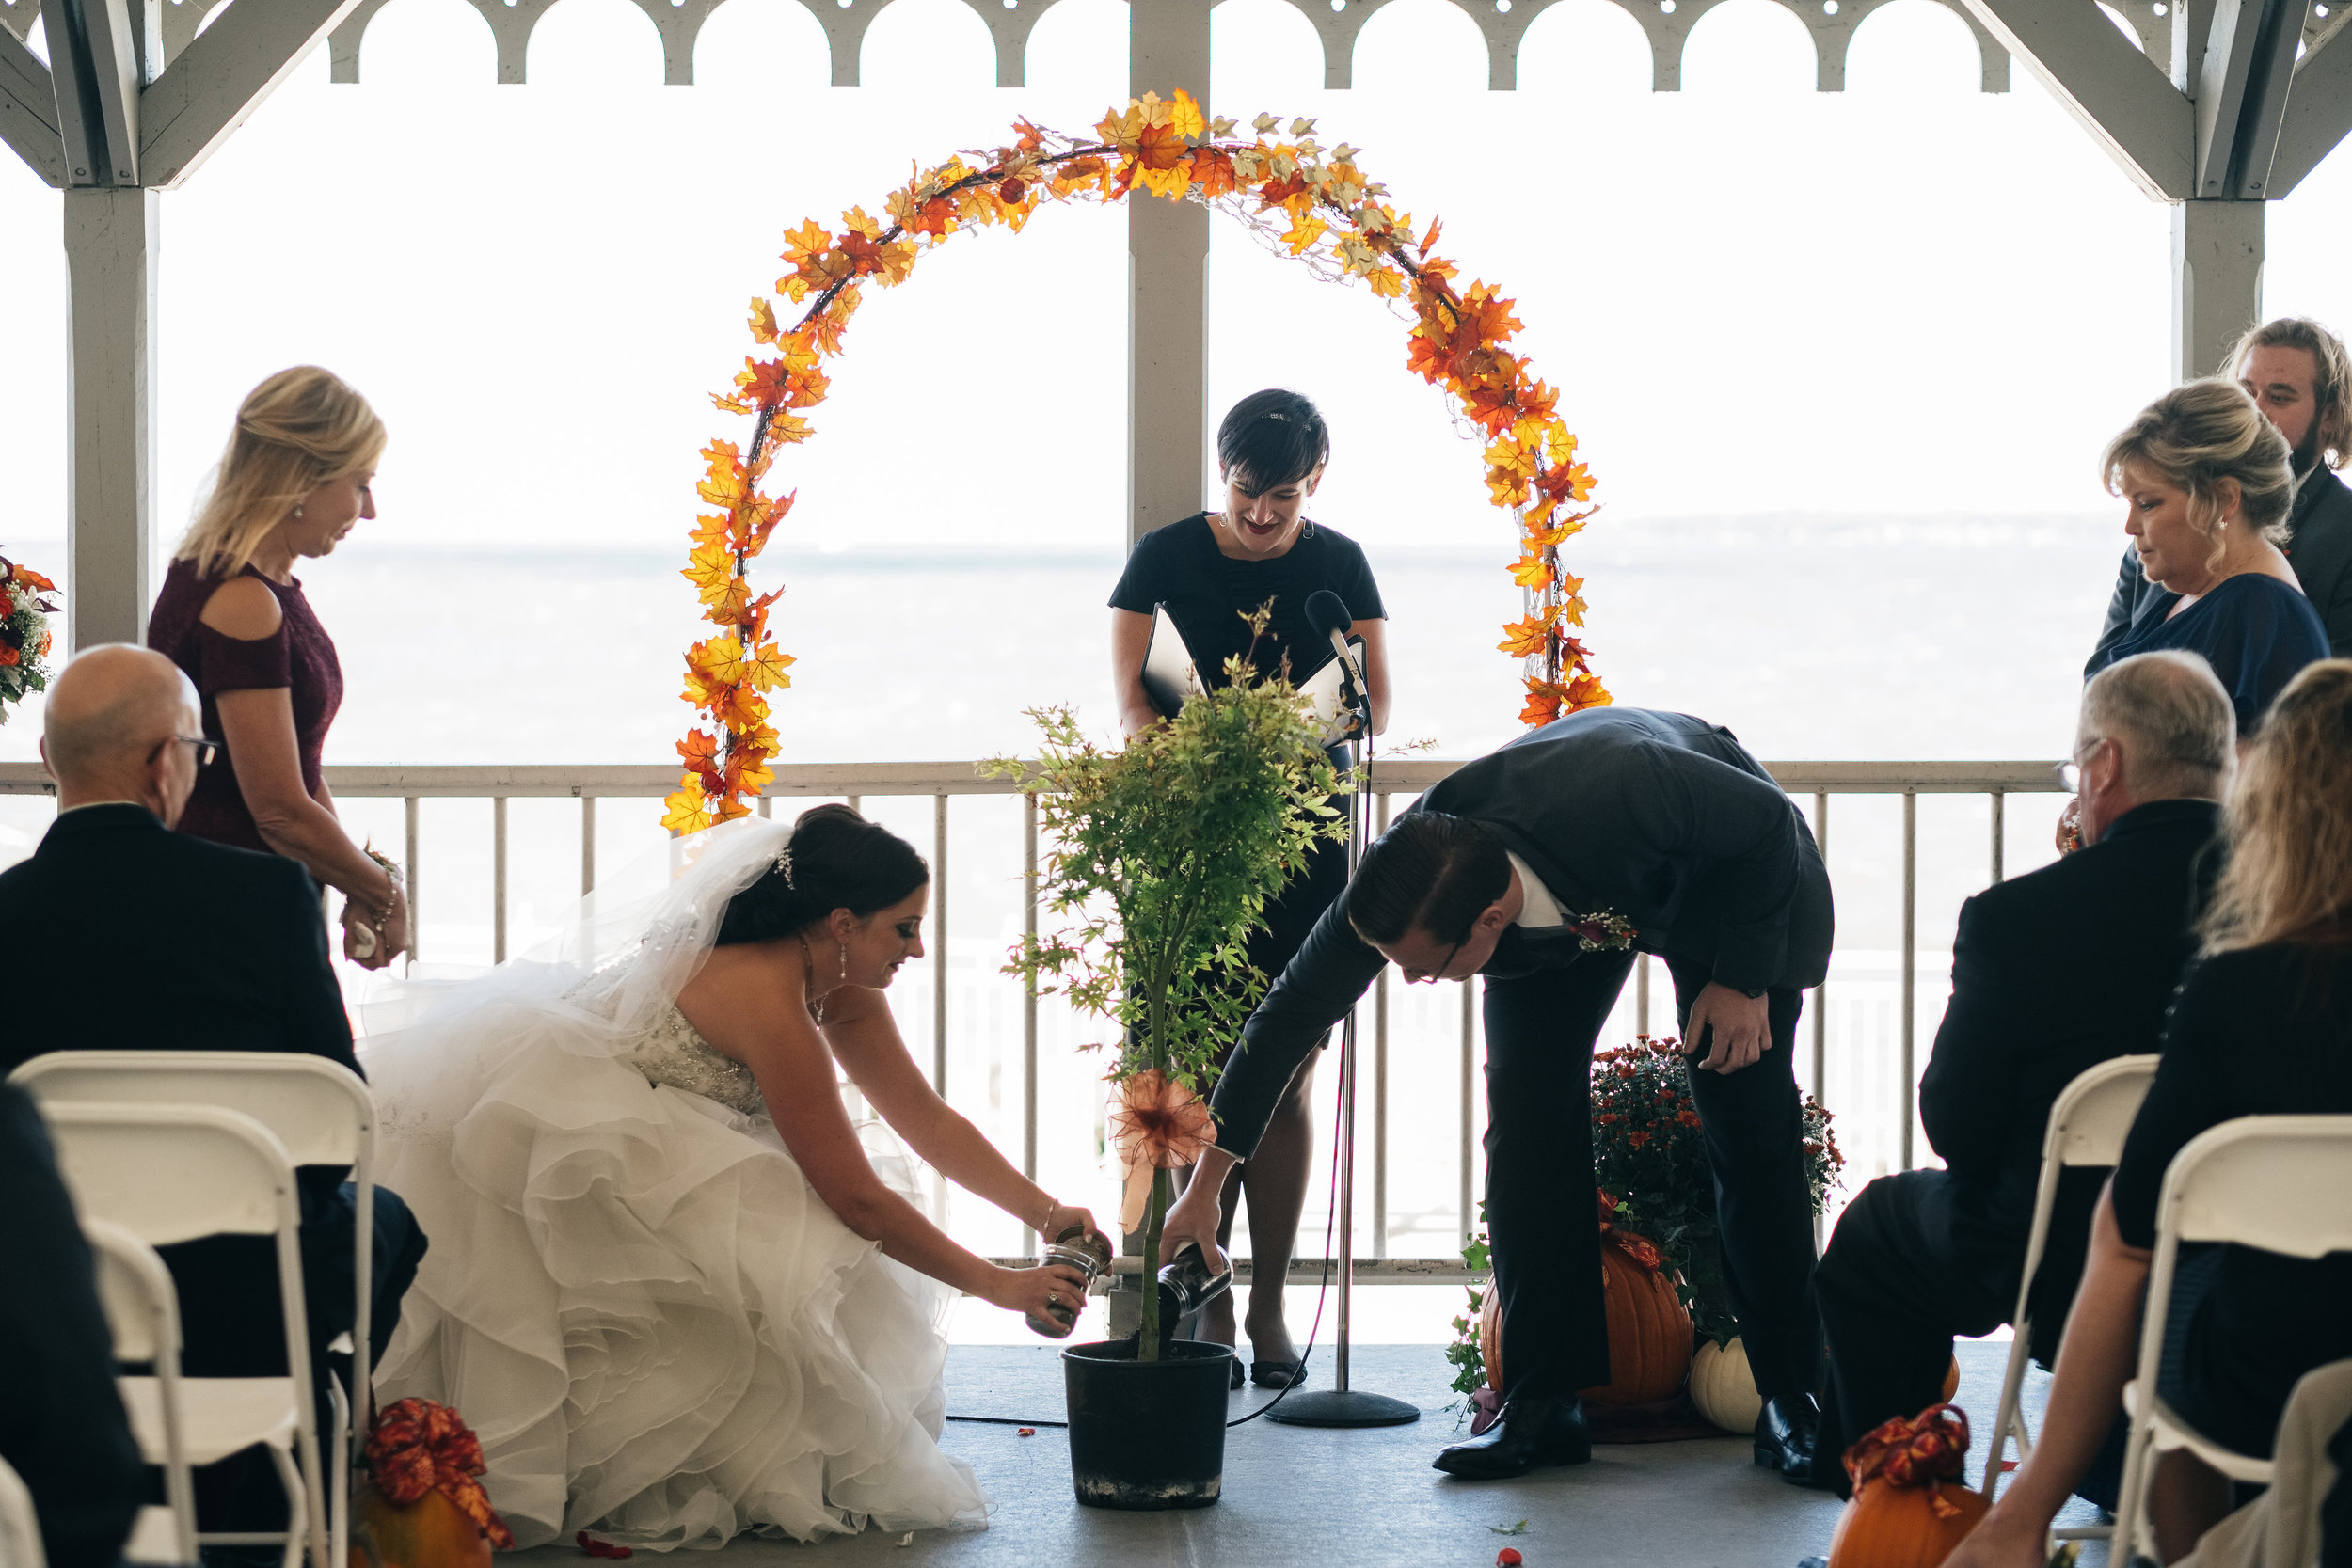 Toledo Couple Plants Tree at Unity Ceremony in Ohio With Photographers from Northwest Ohio